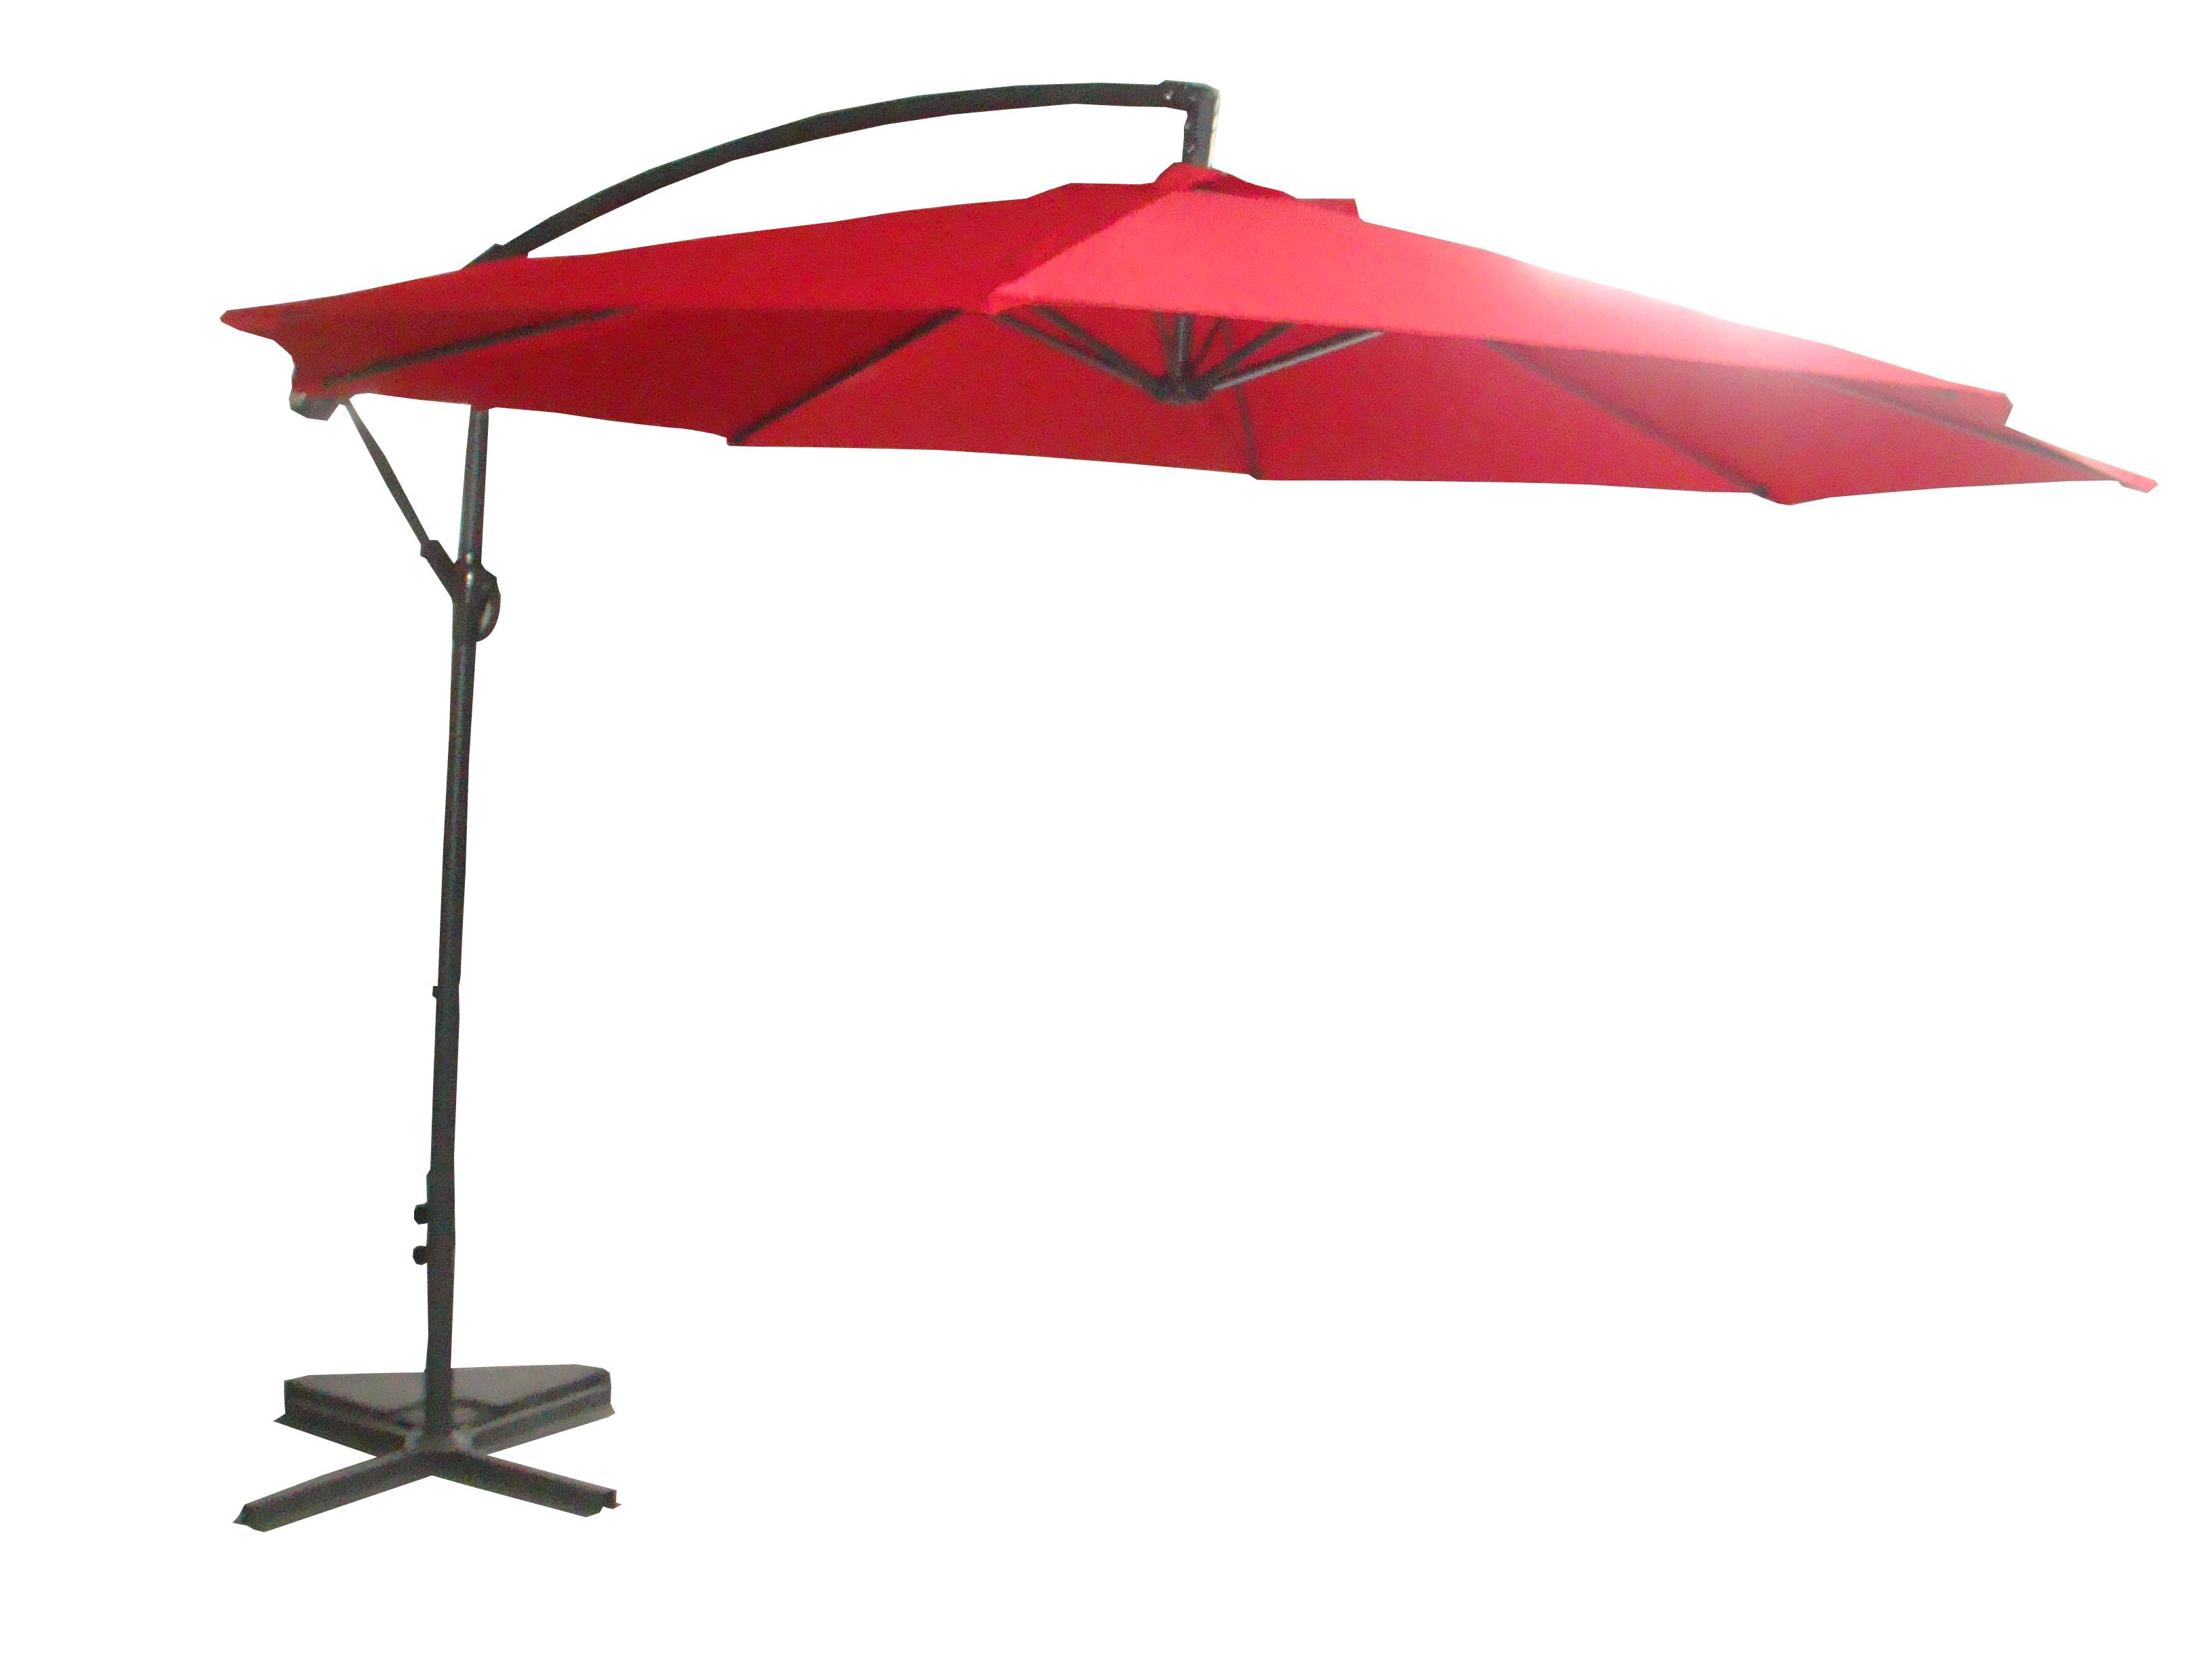 Palm-Springs-10ft-Offset-Garden-Umbrella-Outdoor-Patio-Hanging-Canopy thumbnail 9